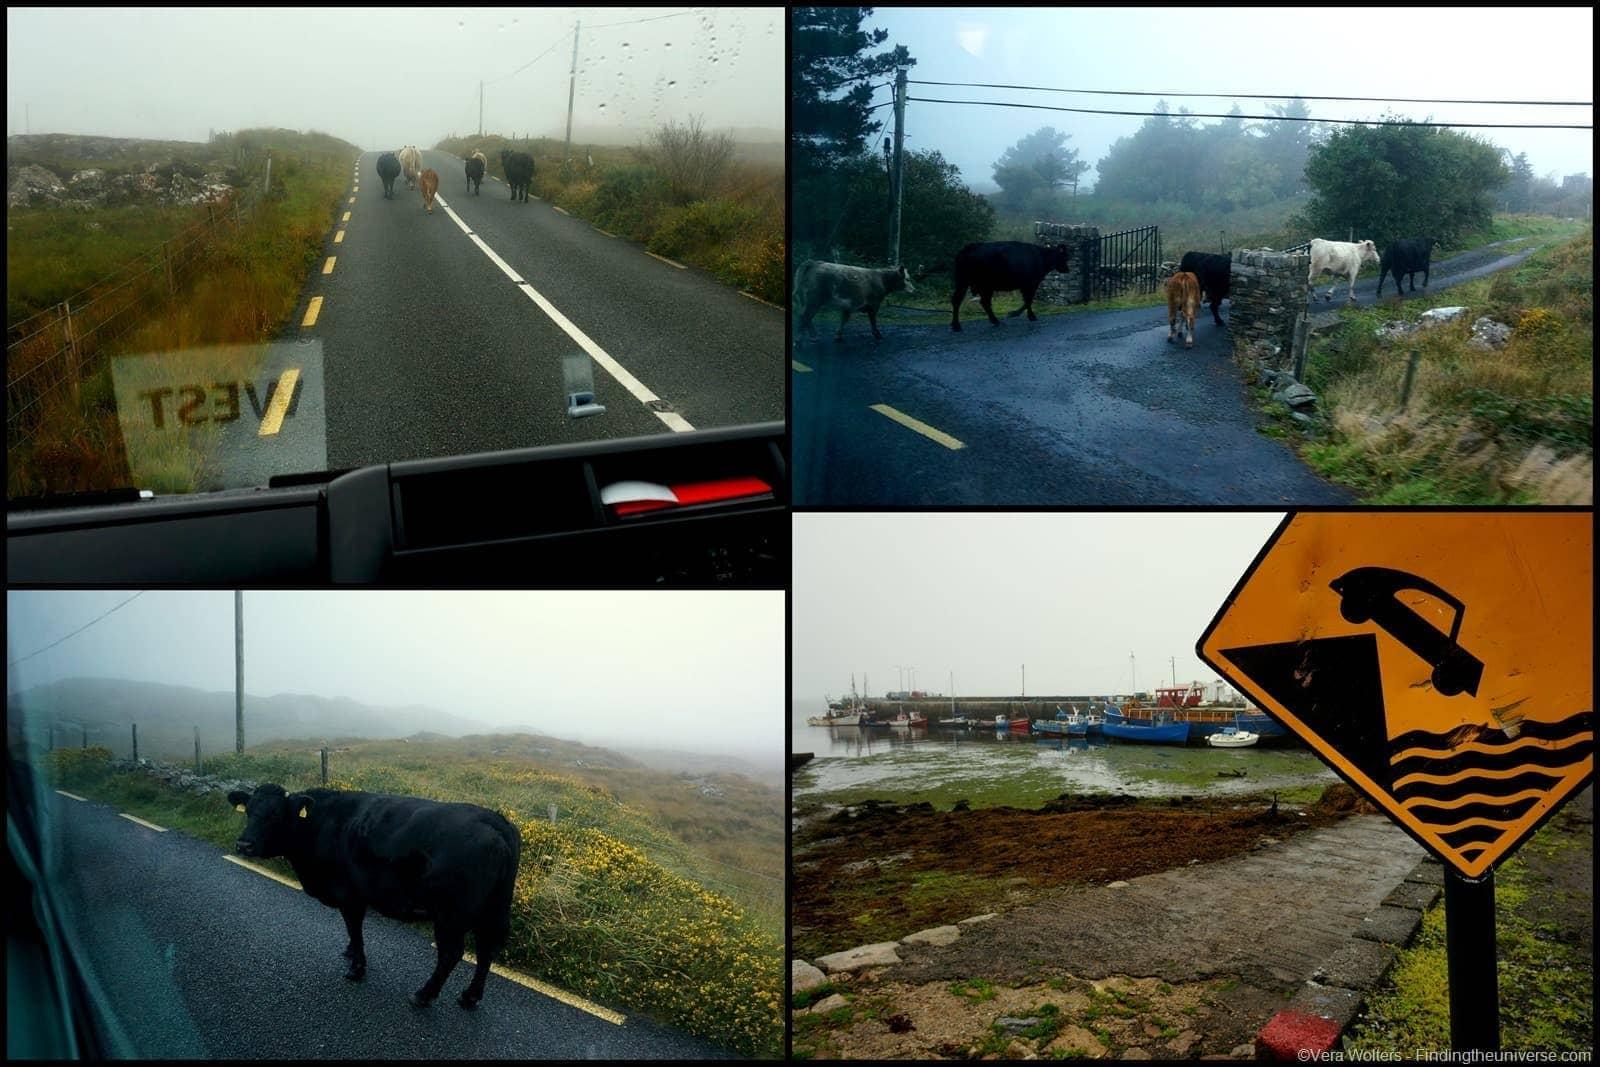 Cow jam - Connemara, Ireland